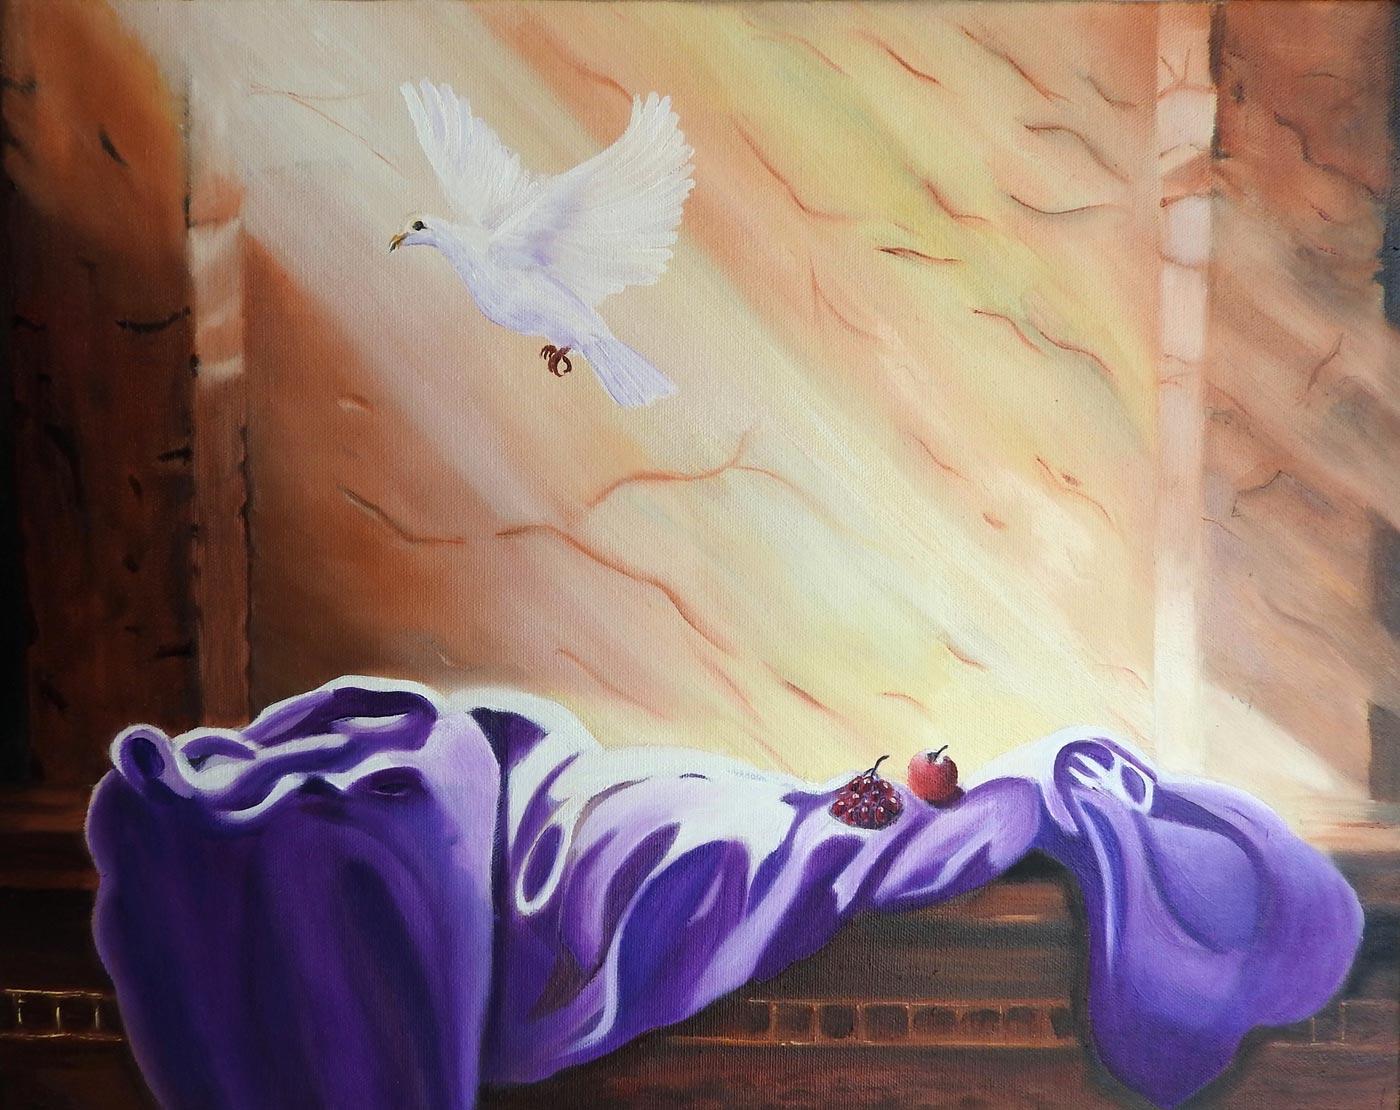 Daugie Law - The bird has flown